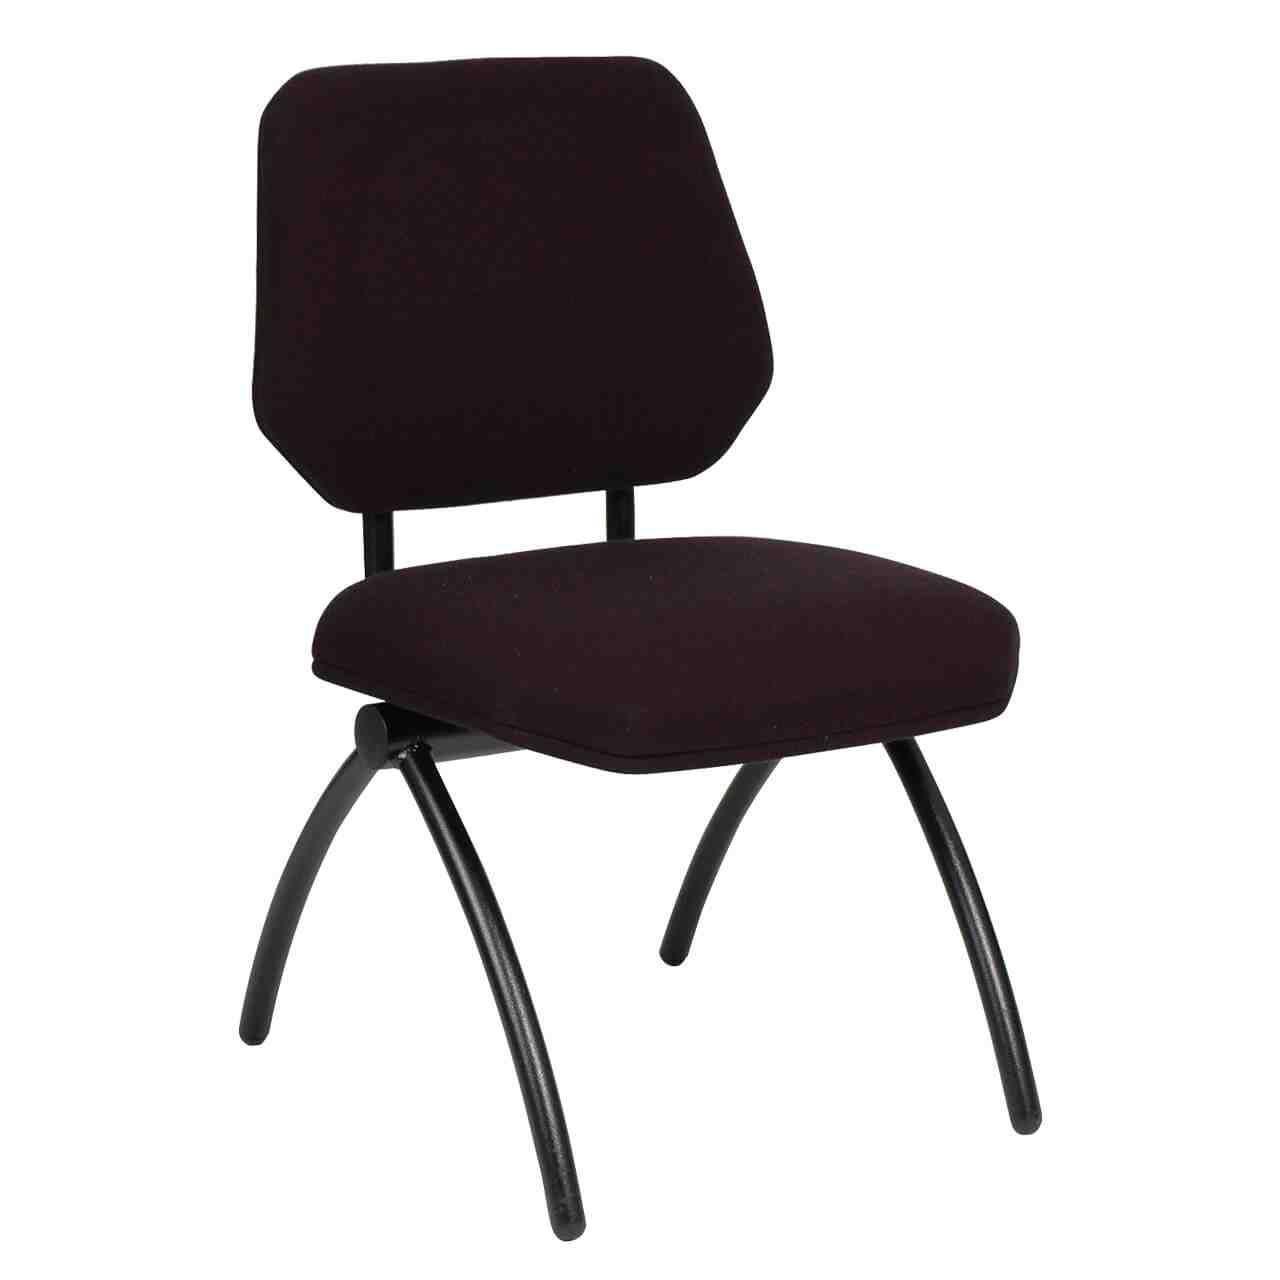 Max wachtkamerstoel obesitas xxl stoelen ARTNRNNB 0000s 0000 Schuin